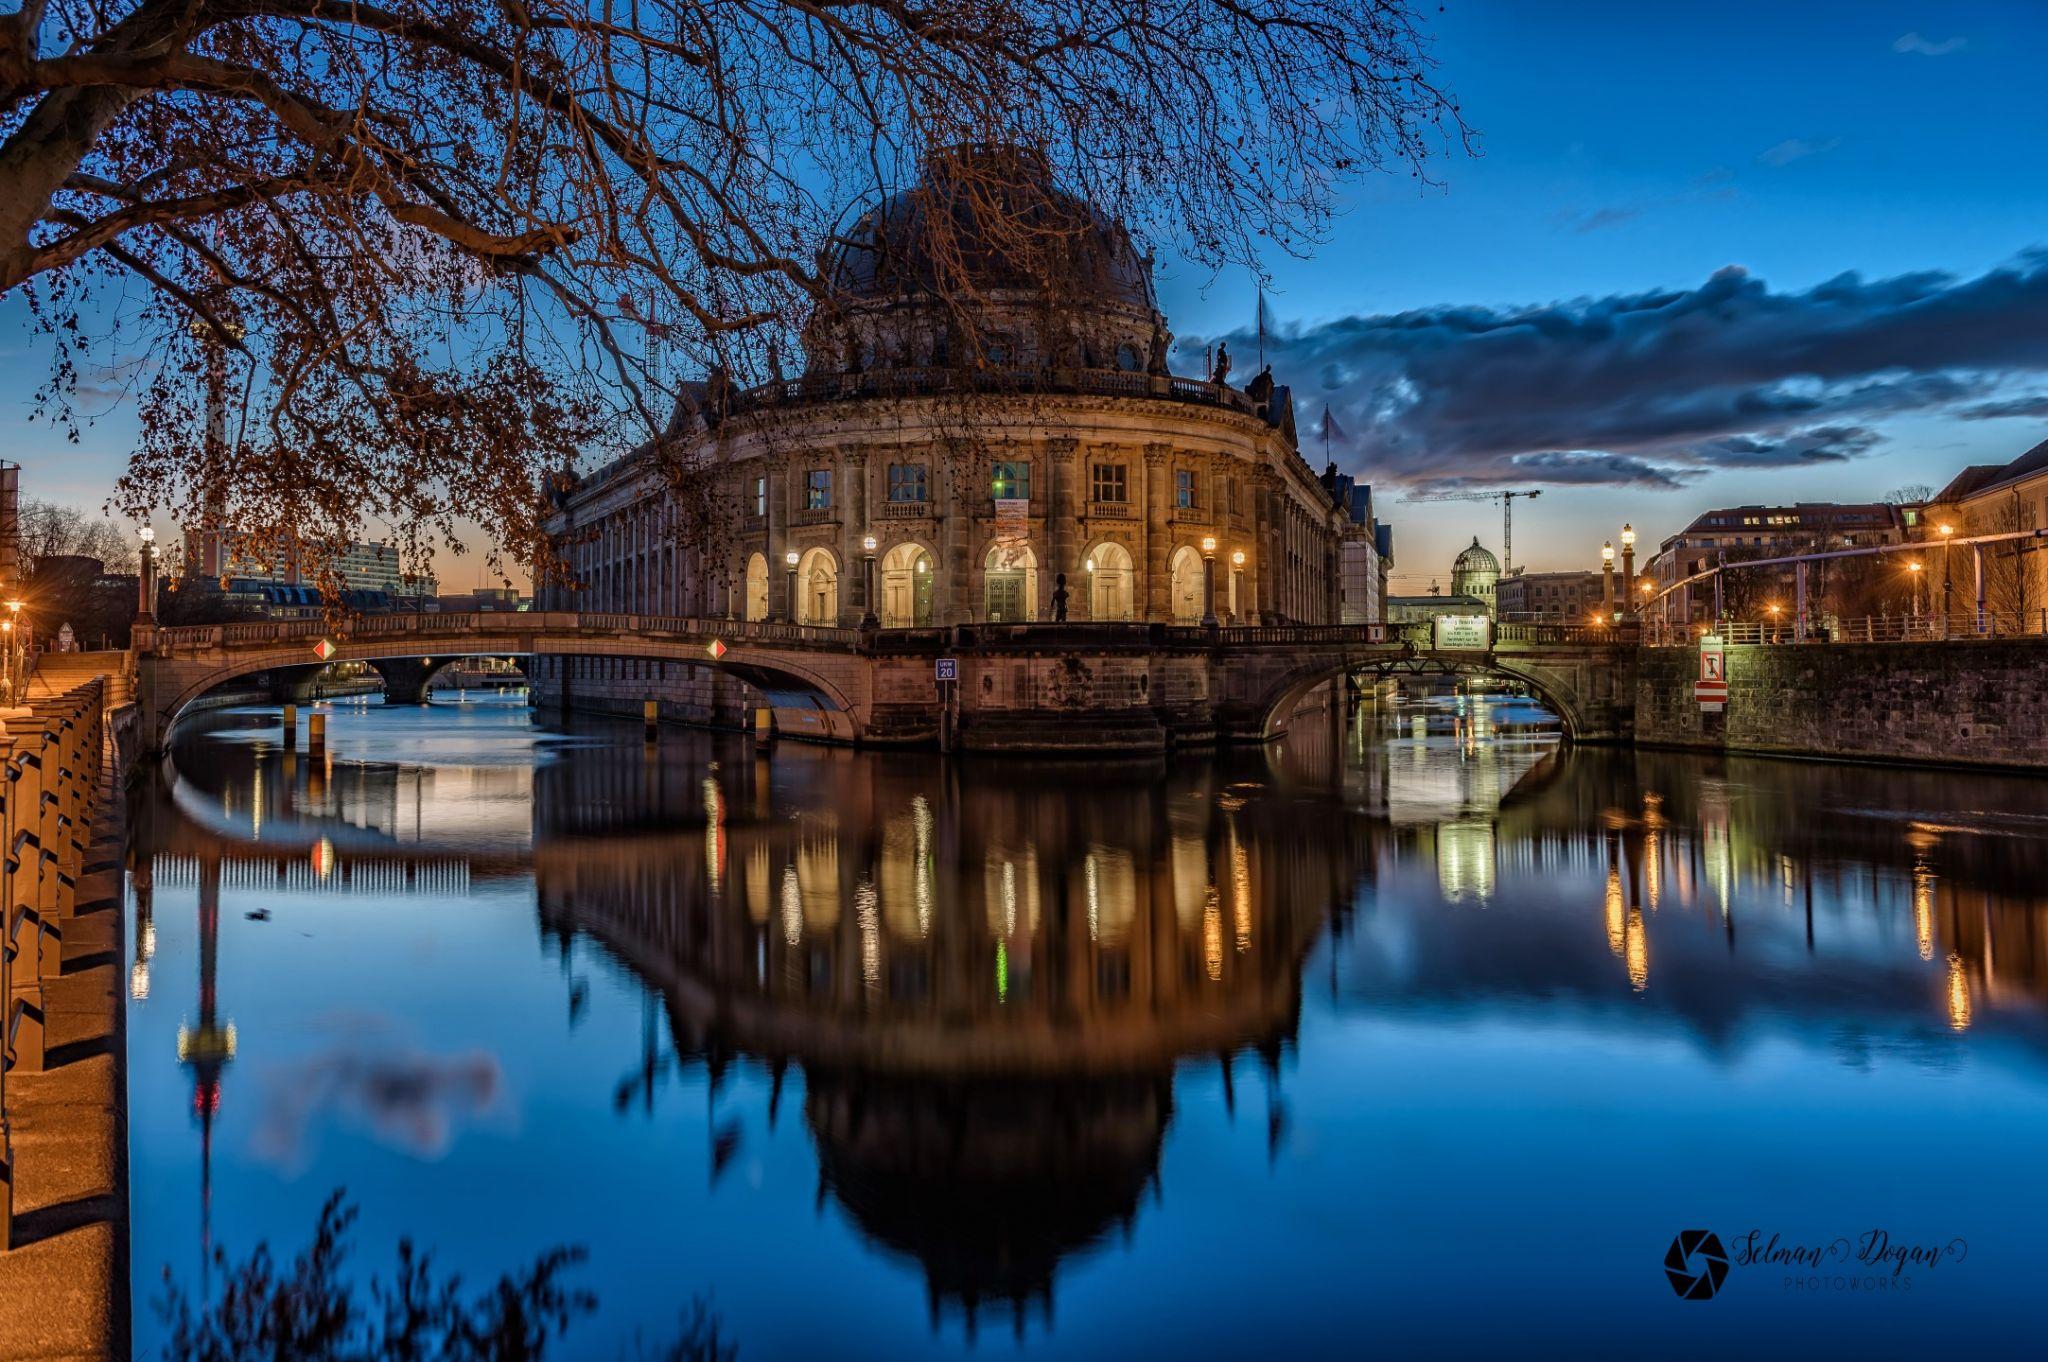 Berlin - Bode Museum, Germany